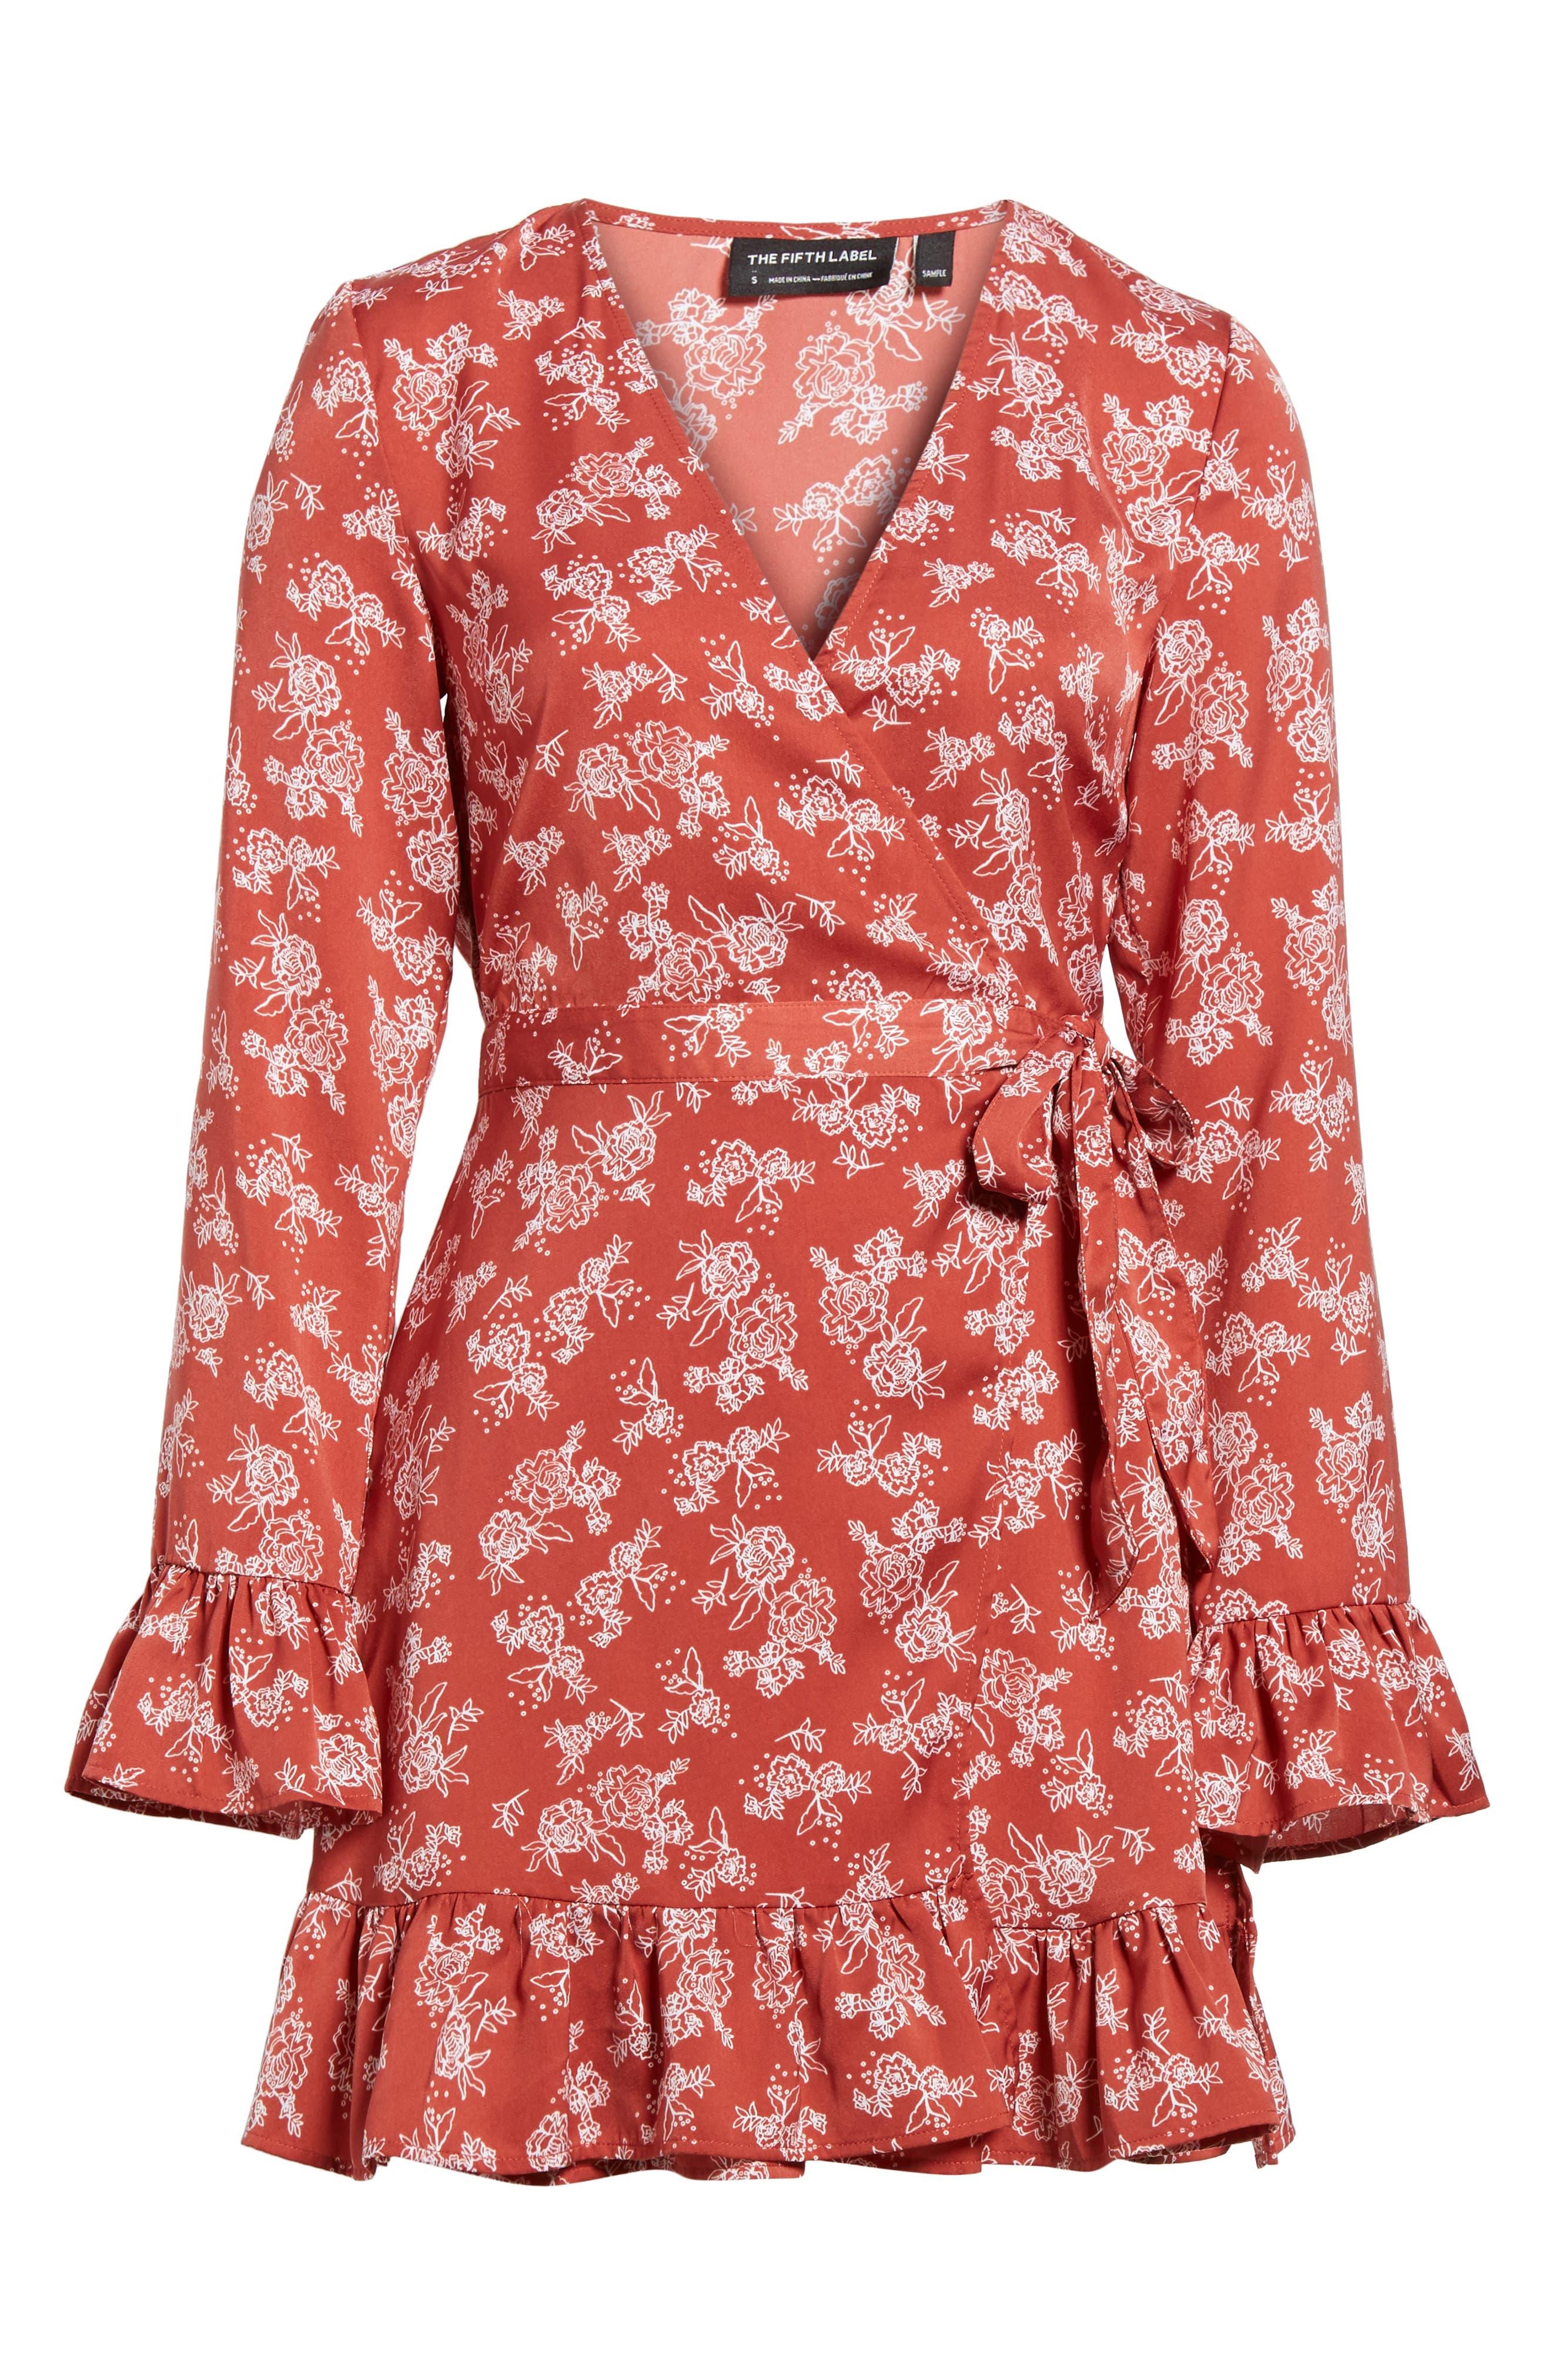 Ophelia Floral Print Wrap Dress,                             Alternate thumbnail 6, color,                             600